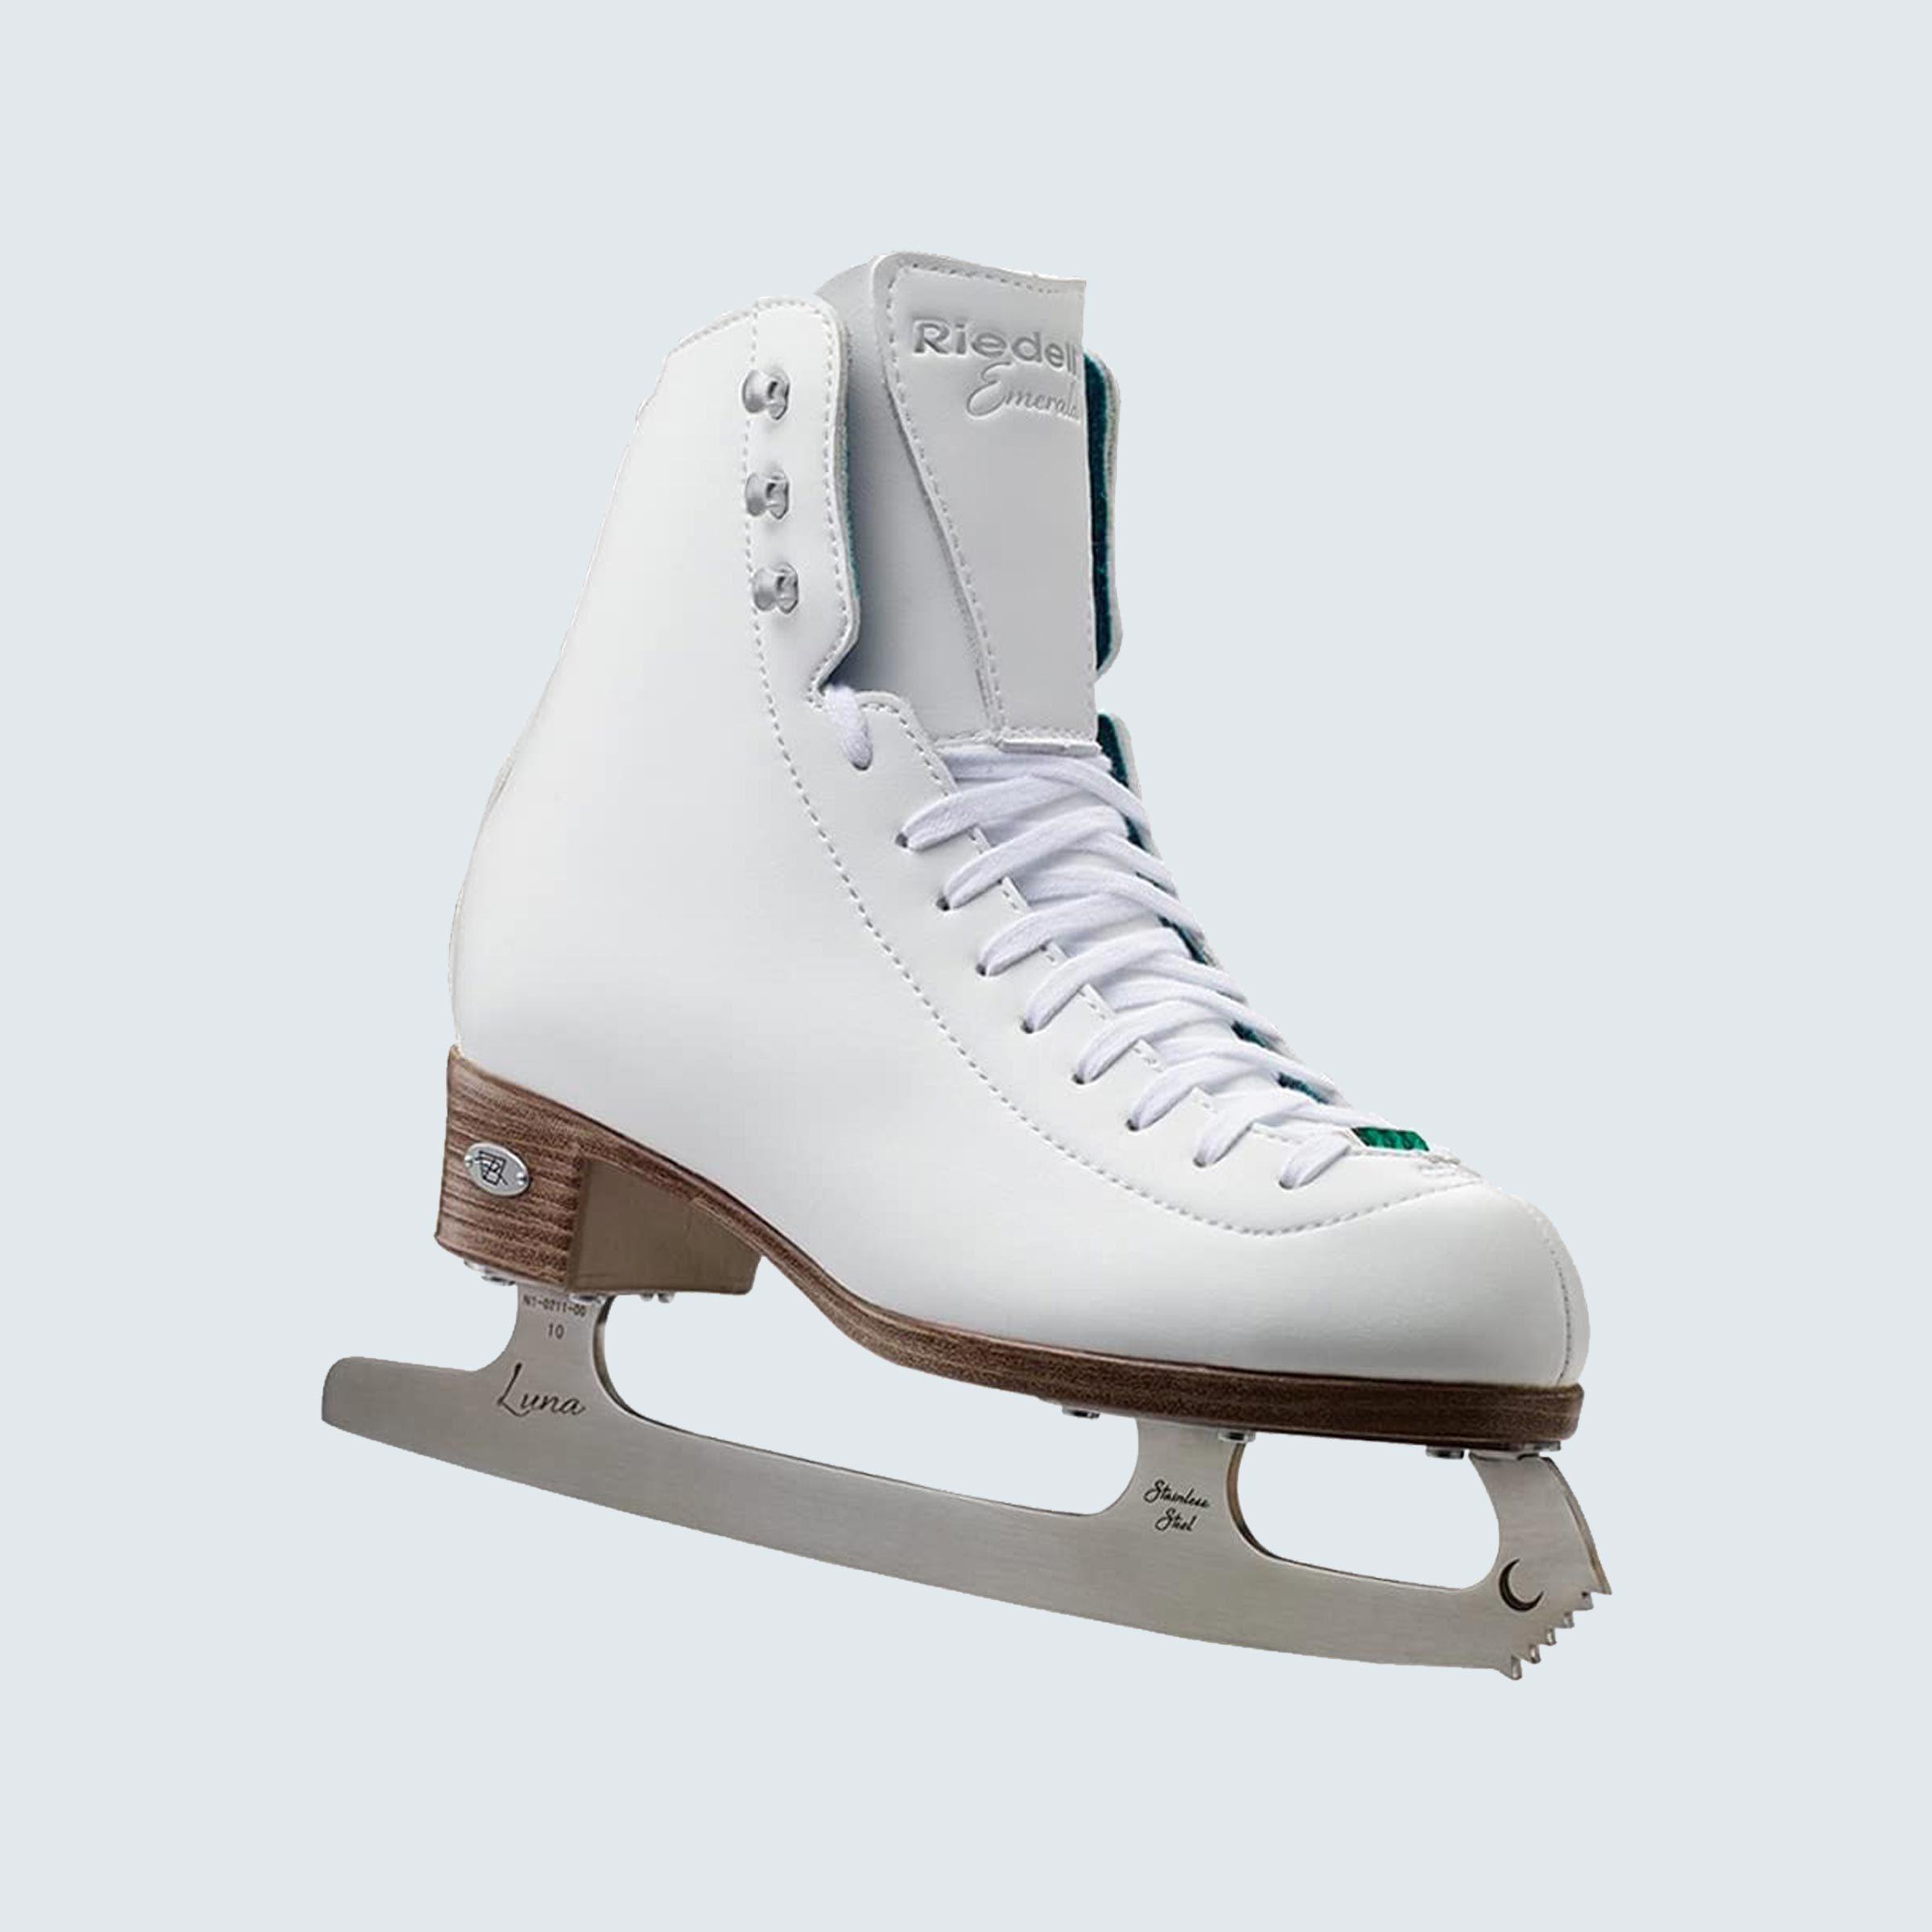 Riedel Figure Skates